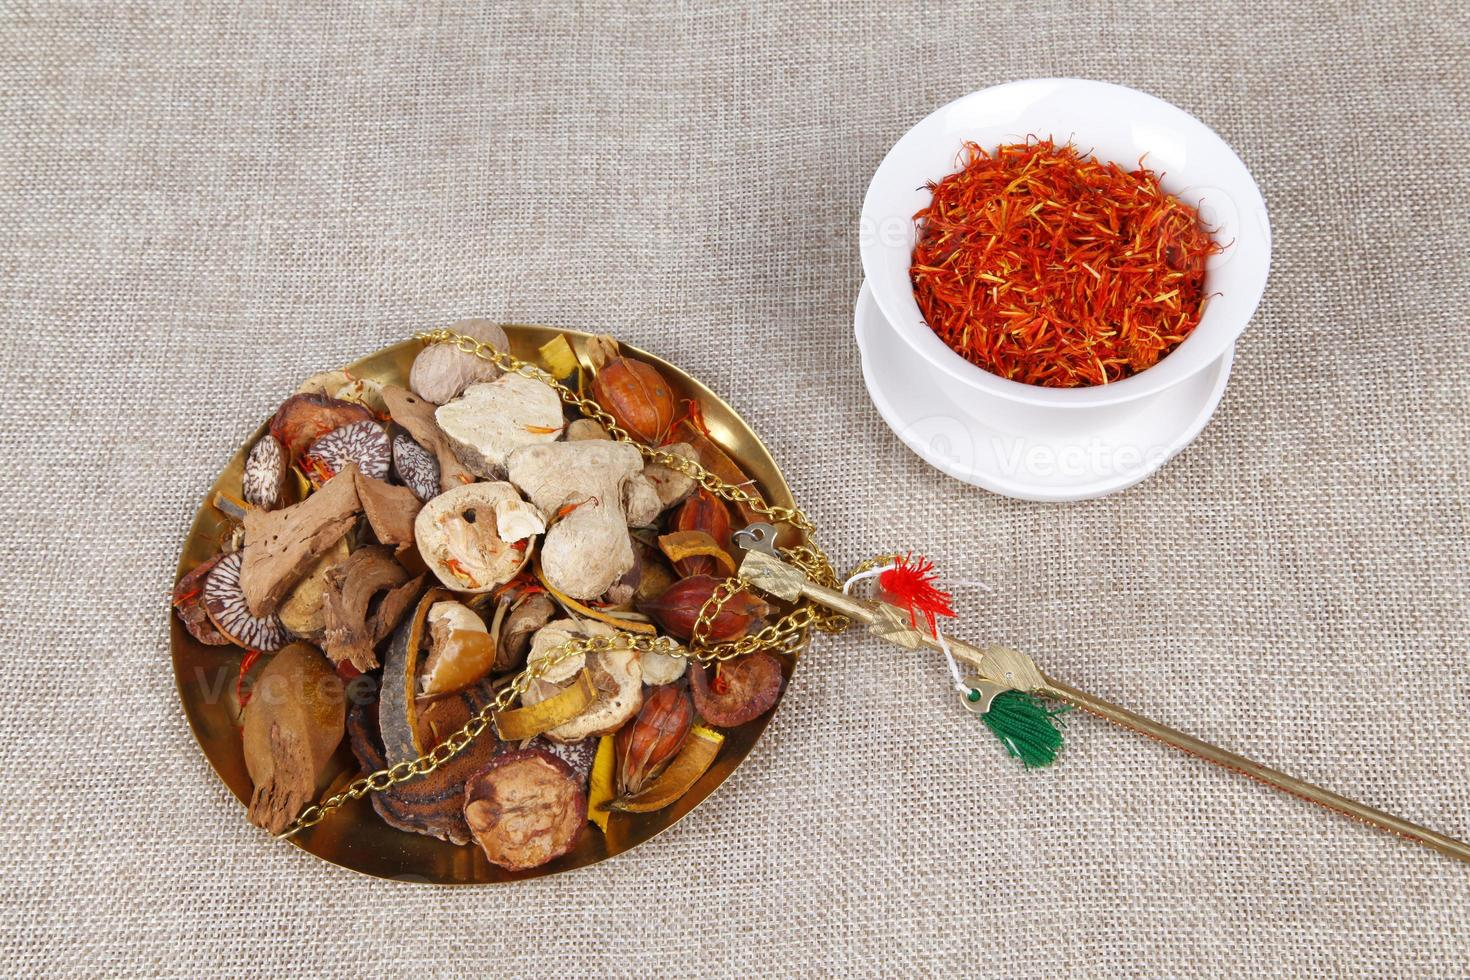 medicina chinesa tradicional (tcm), close-up foto